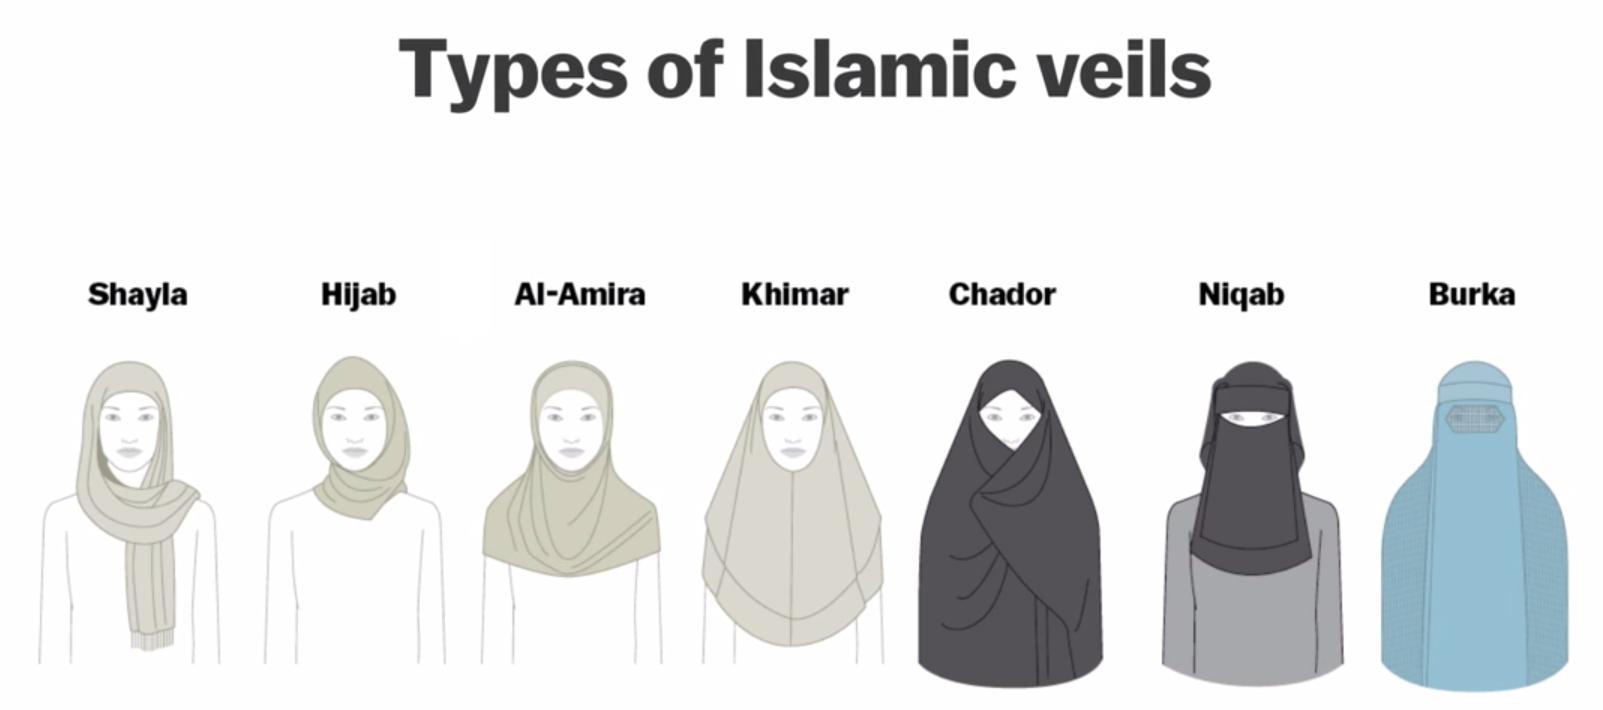 http://barringtonstageco.org/types-of-islamic-veils/